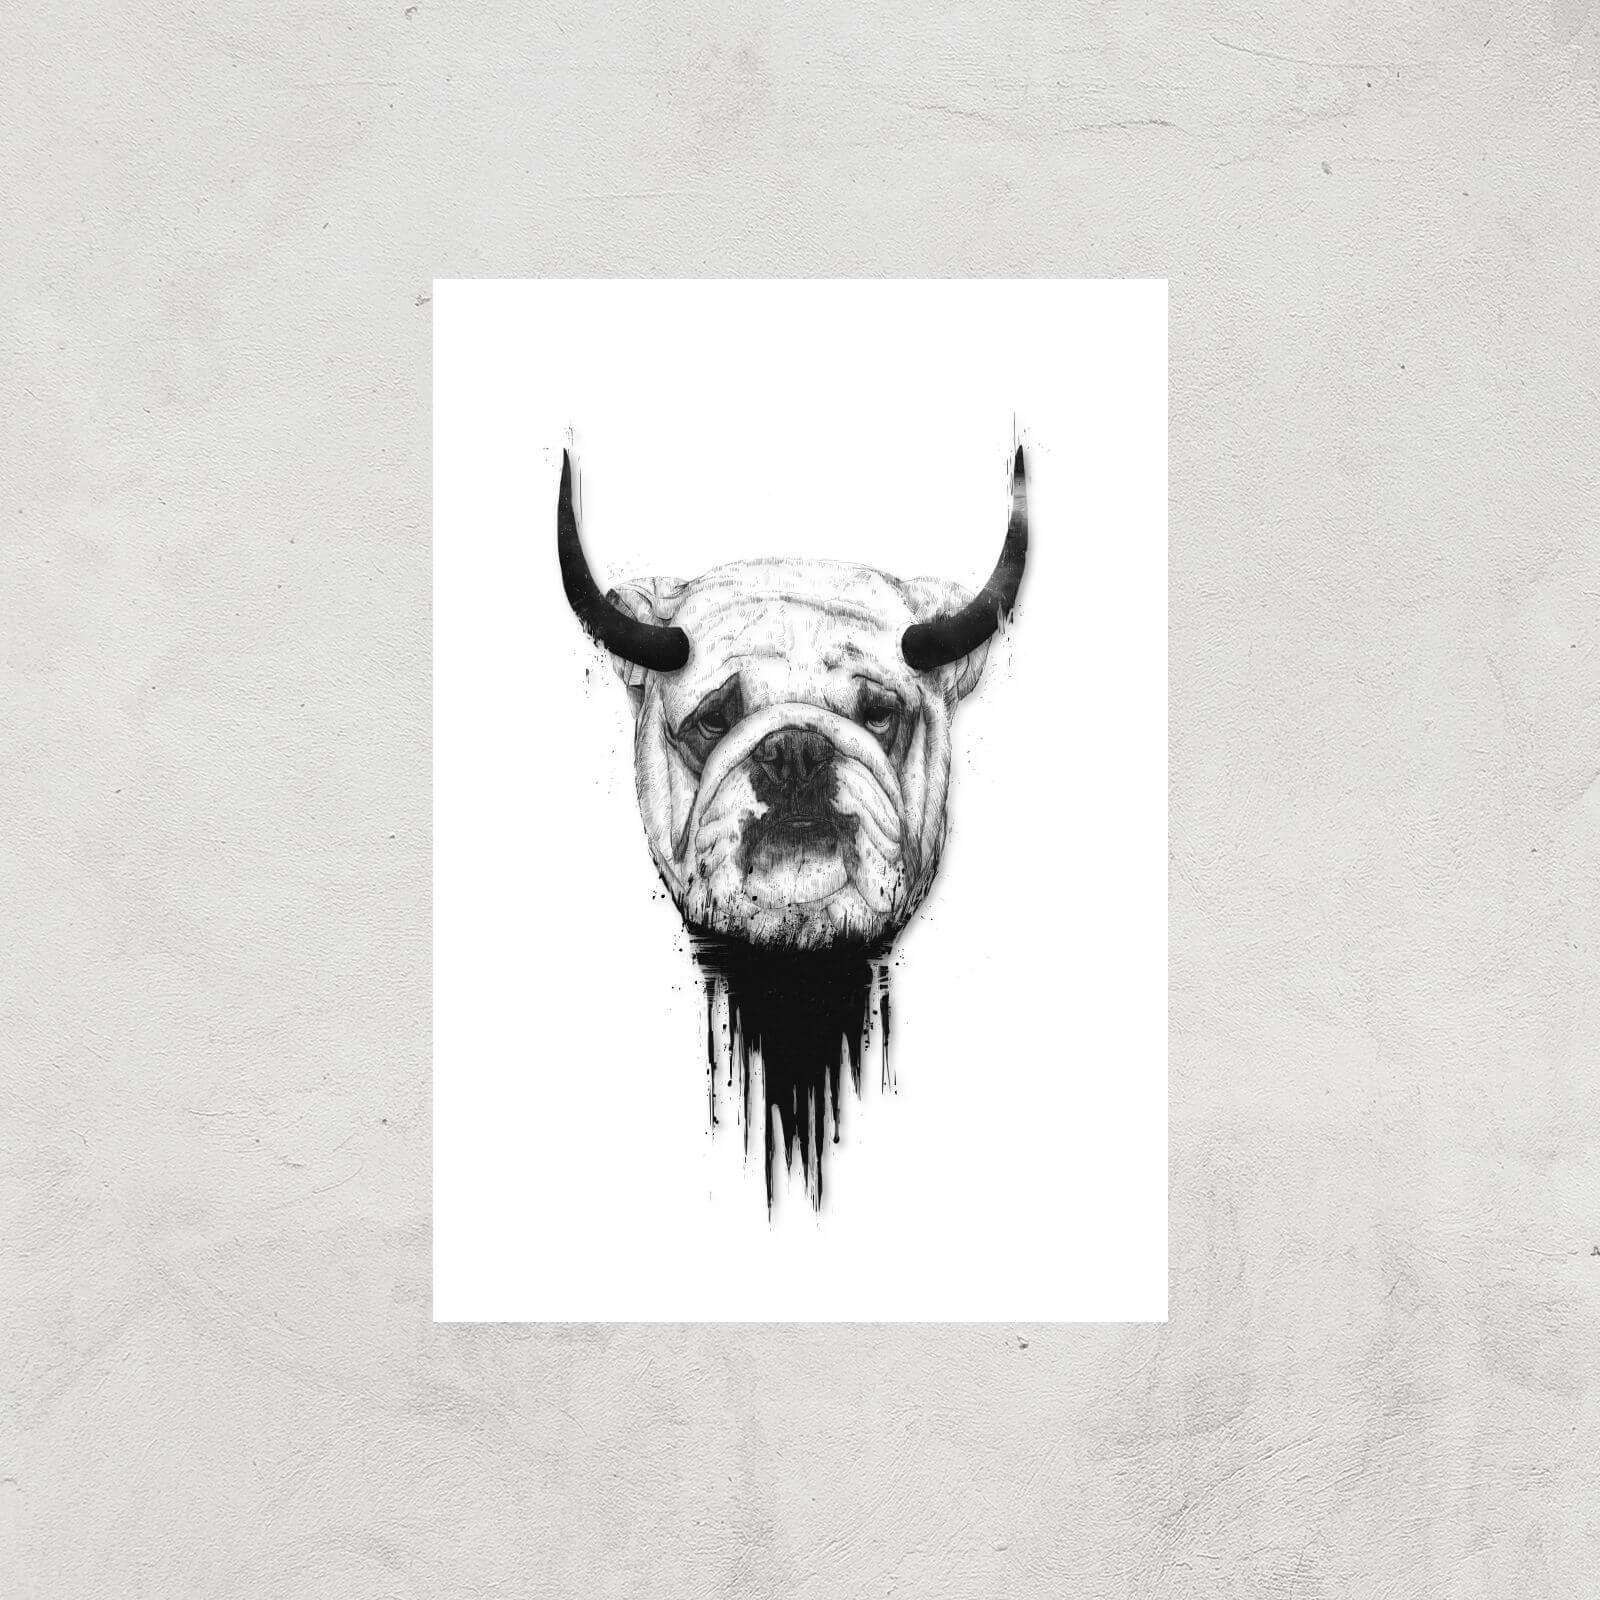 Balazs Solti English Bulldog Art Print - A3 - Print Only